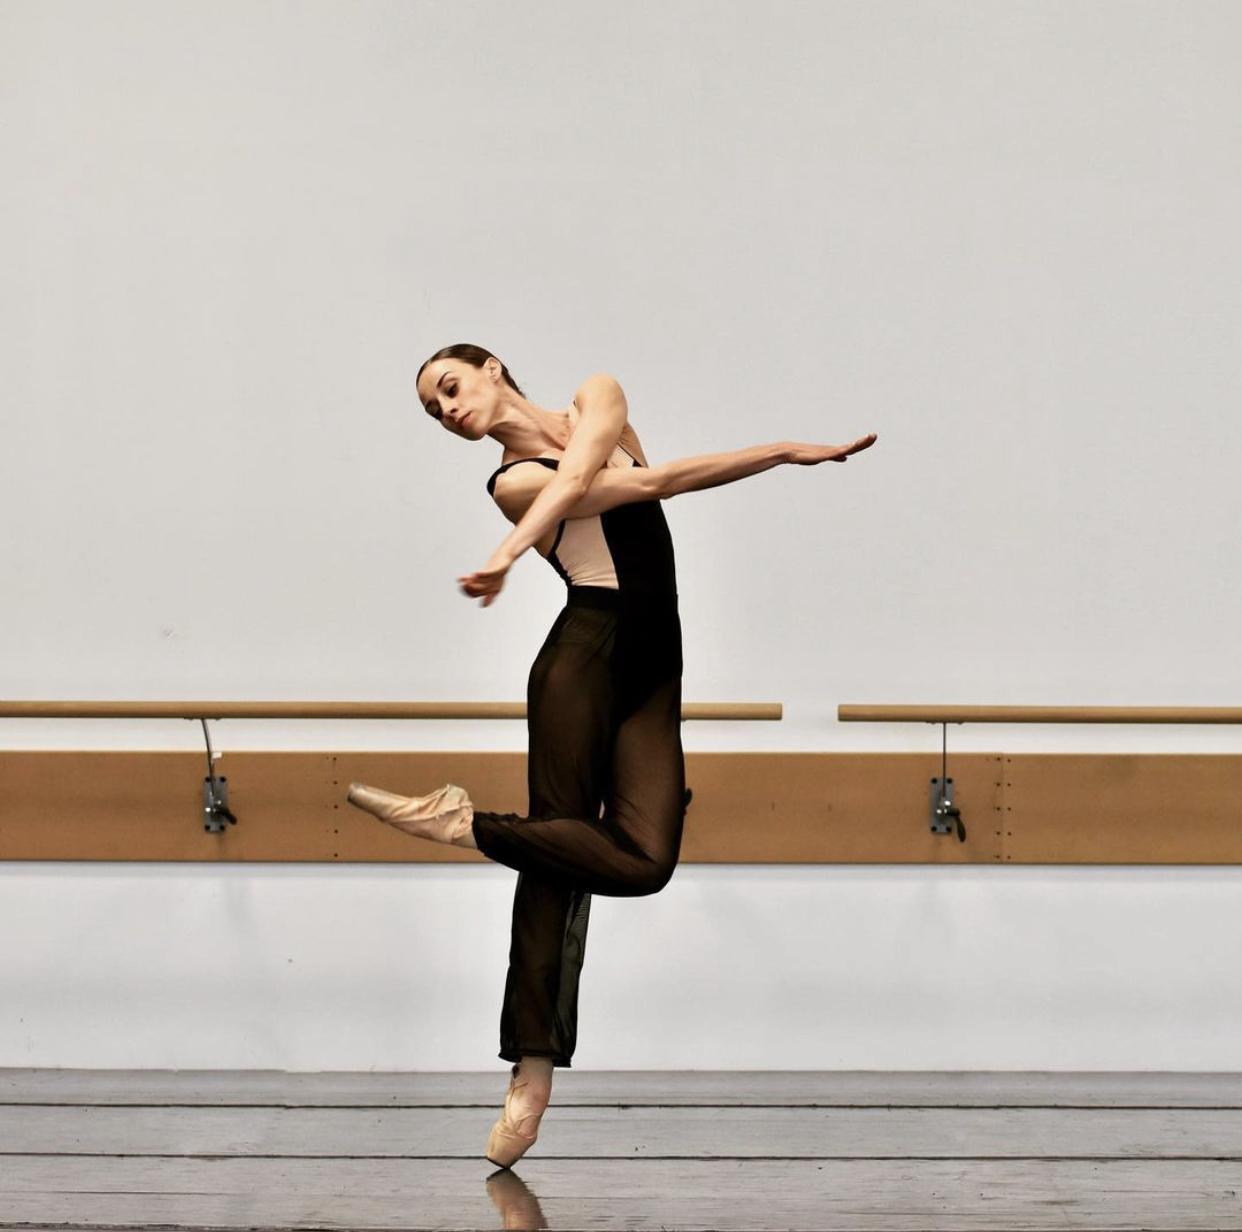 Femme qui danse le ballet Three W.O.A.L